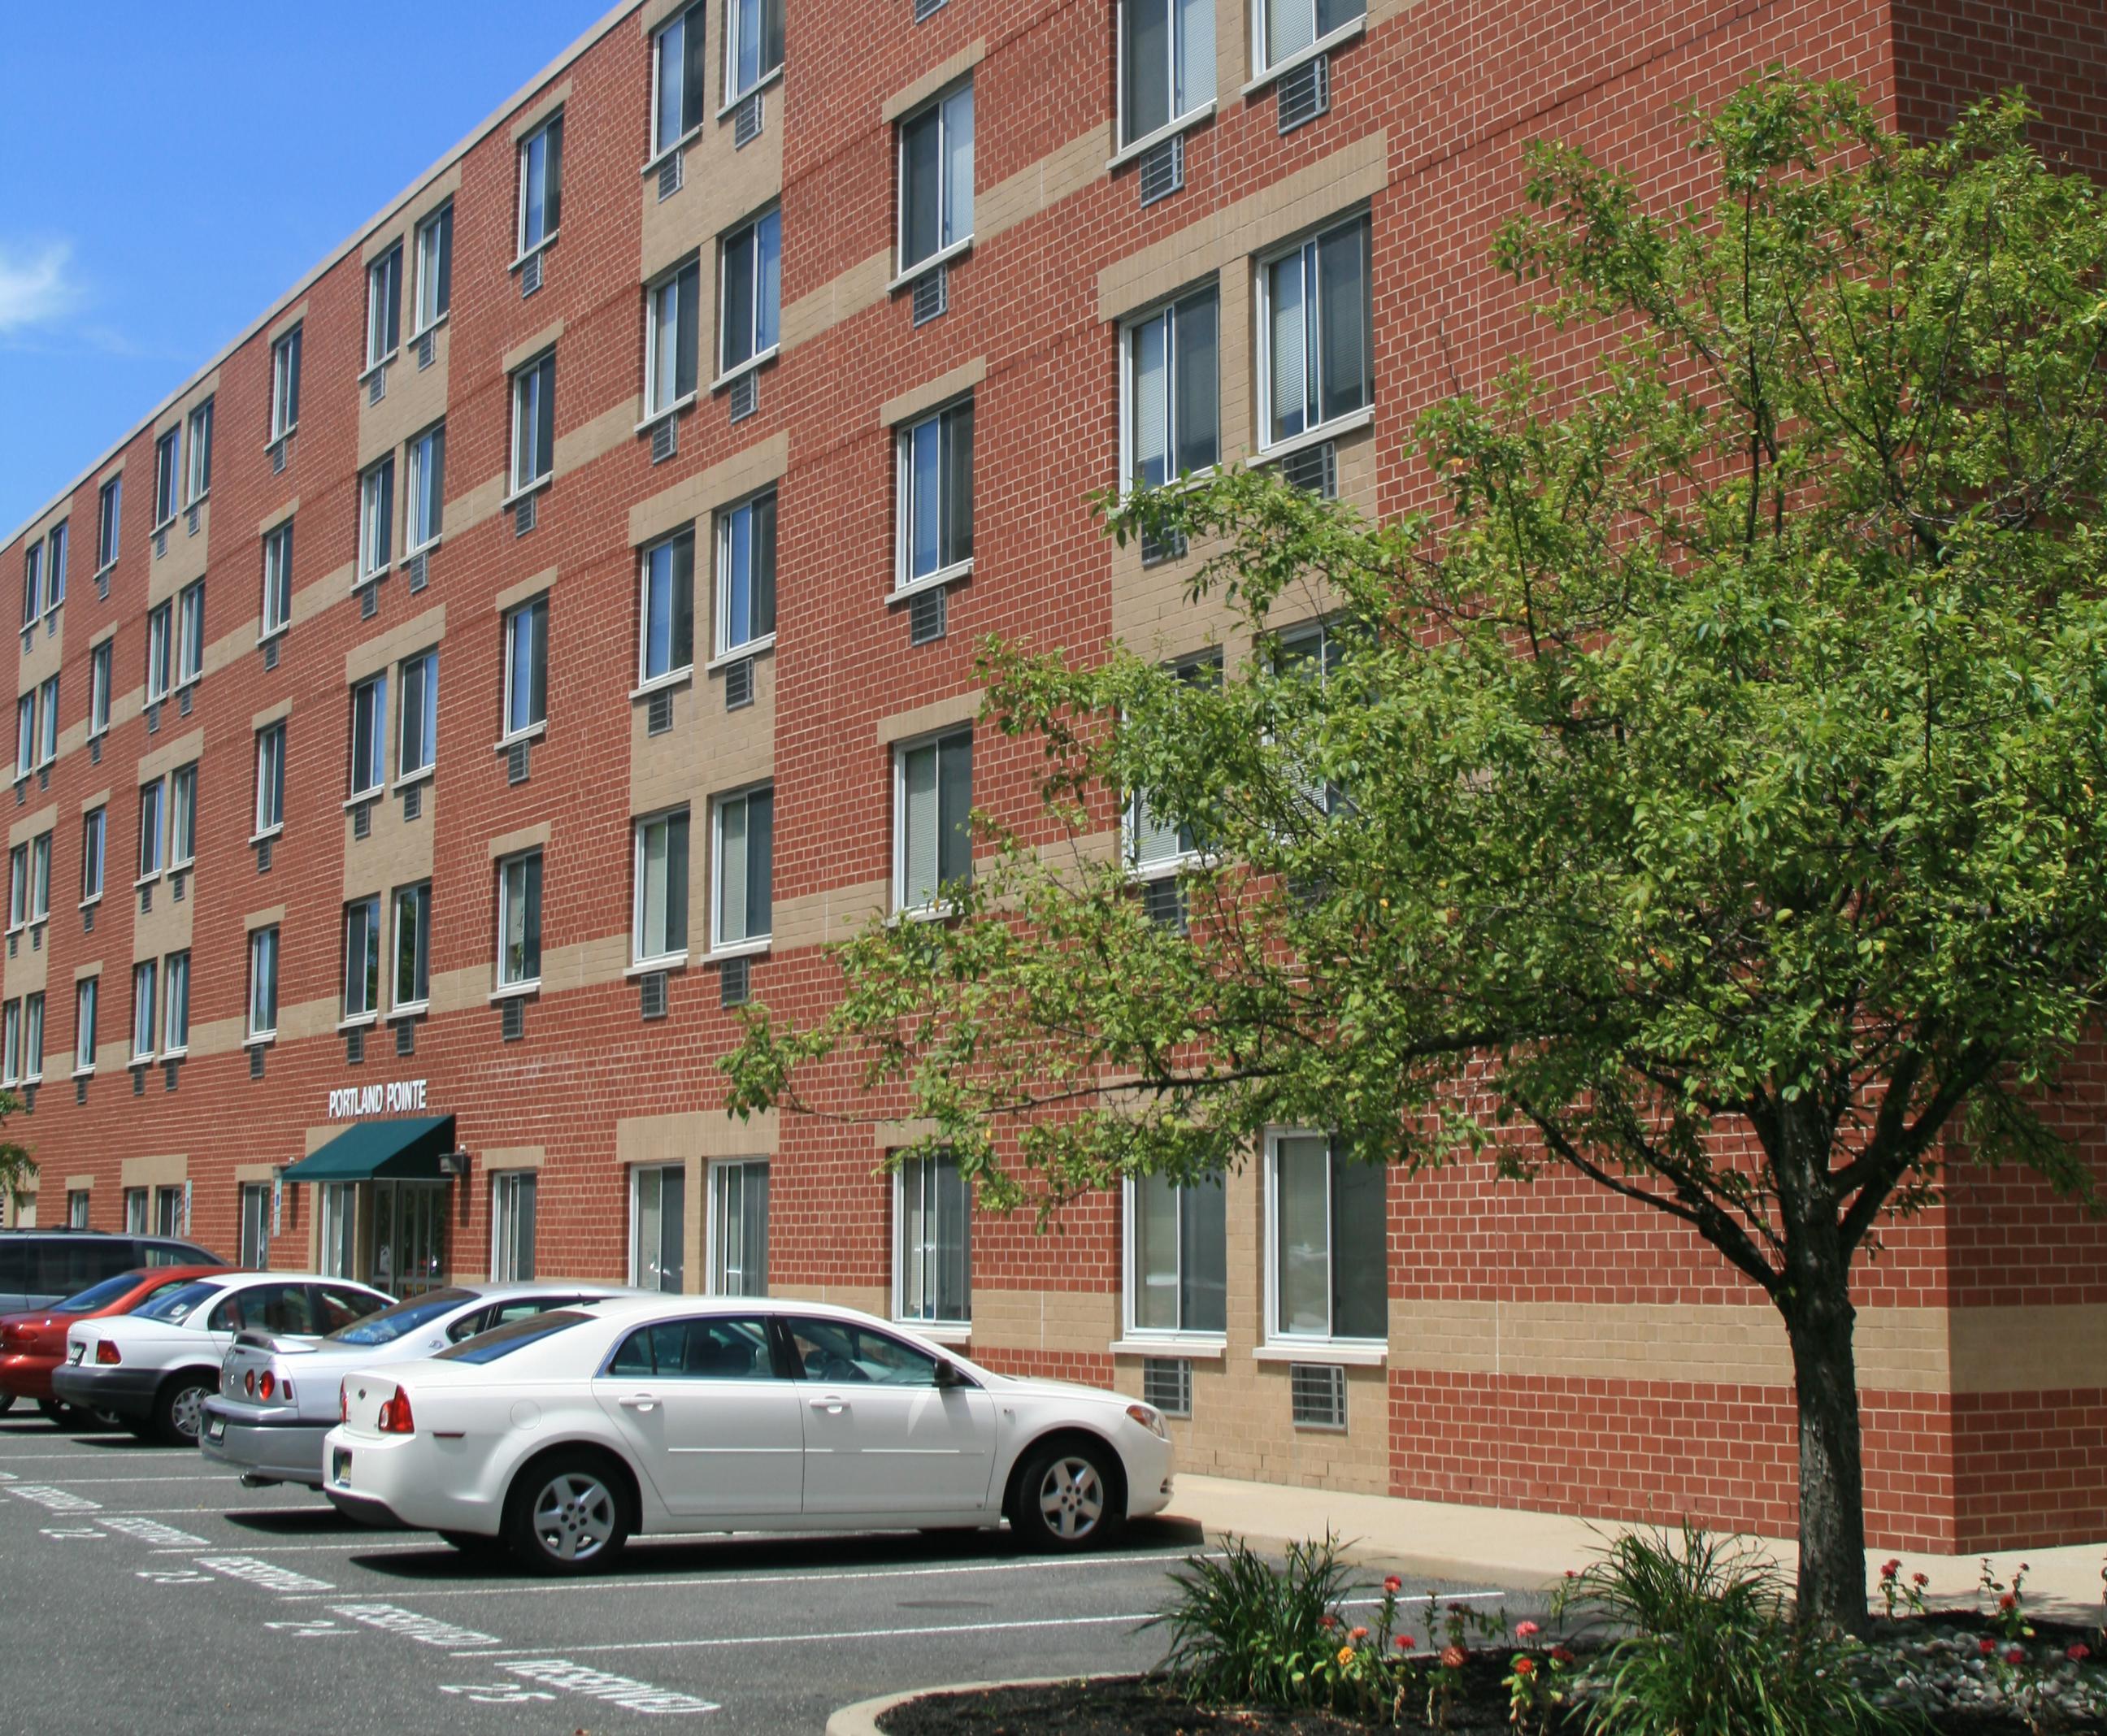 Portland Pointe Senior Apartments